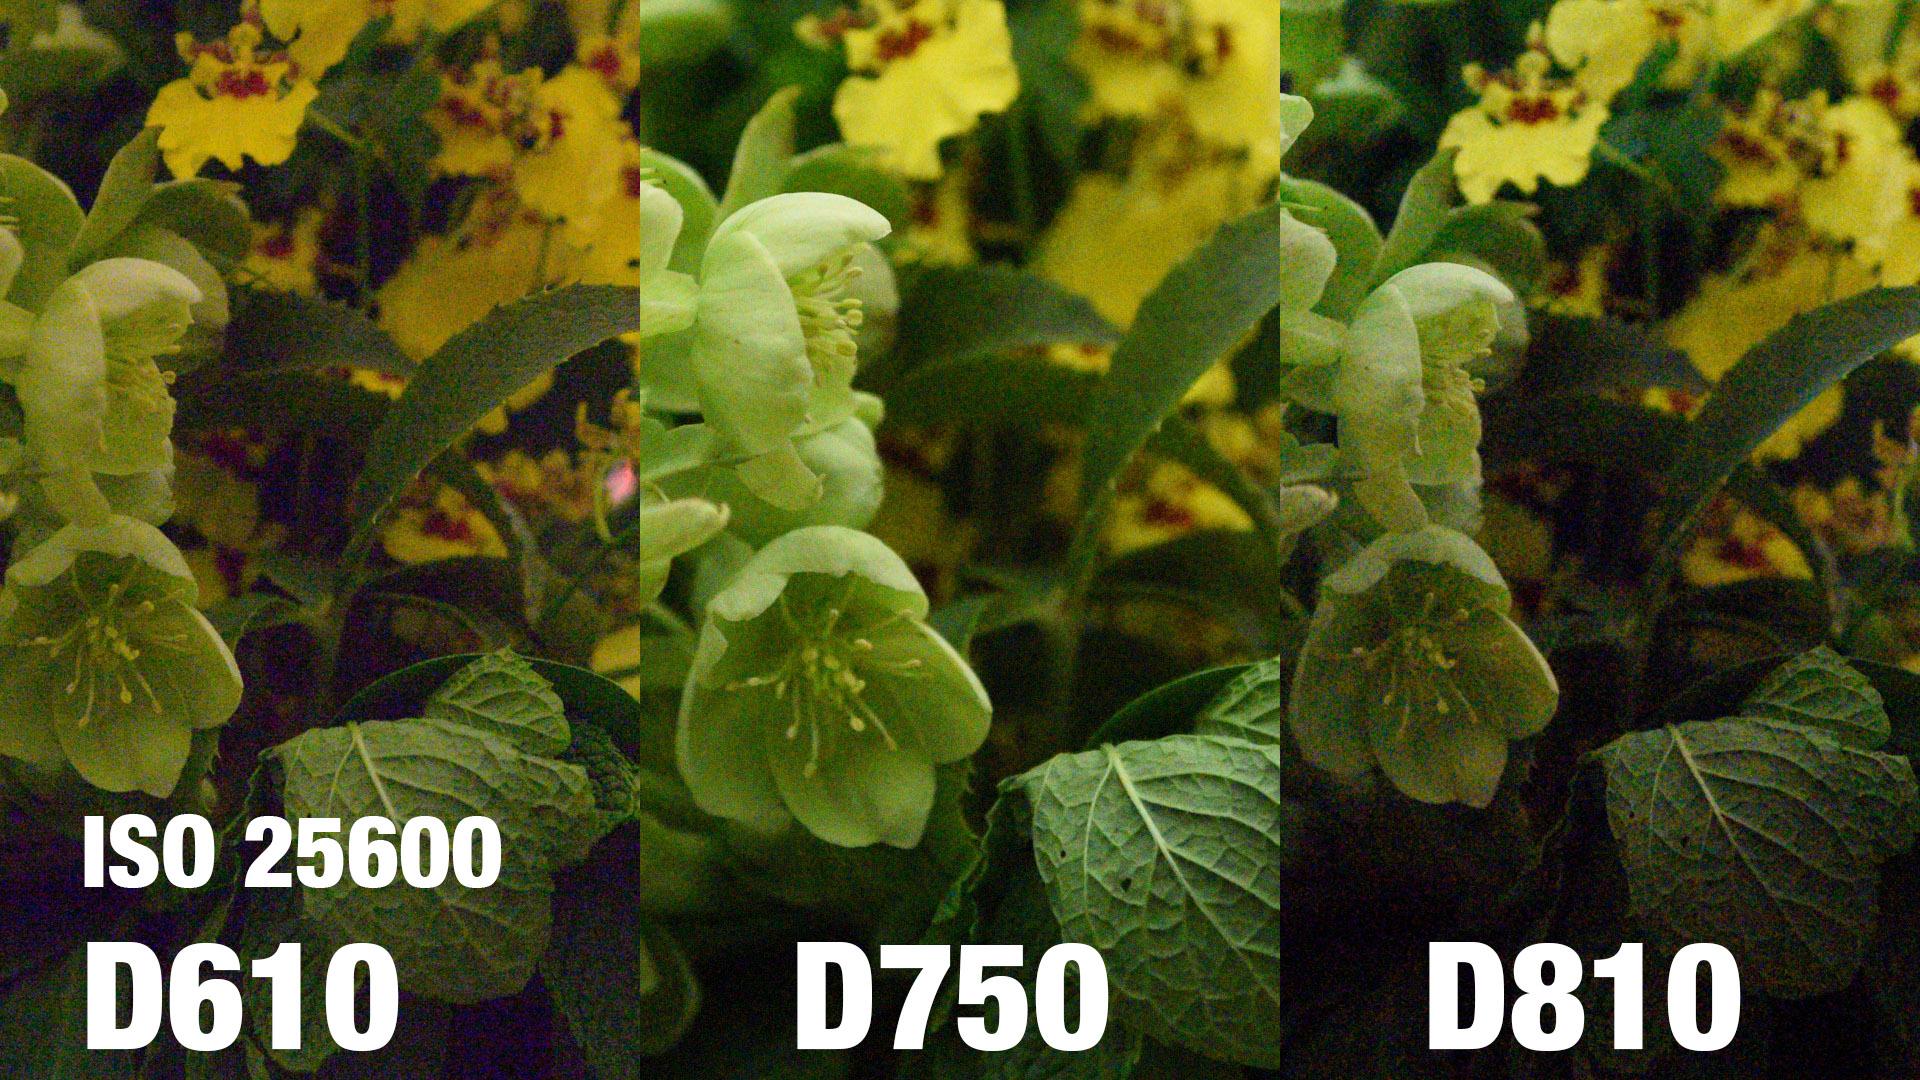 Floor Nikon D610 Vs D750 Rockwell Nikon D610 Vs D750 Iso Review Pits Nikon Against dpreview Nikon D610 Vs D750